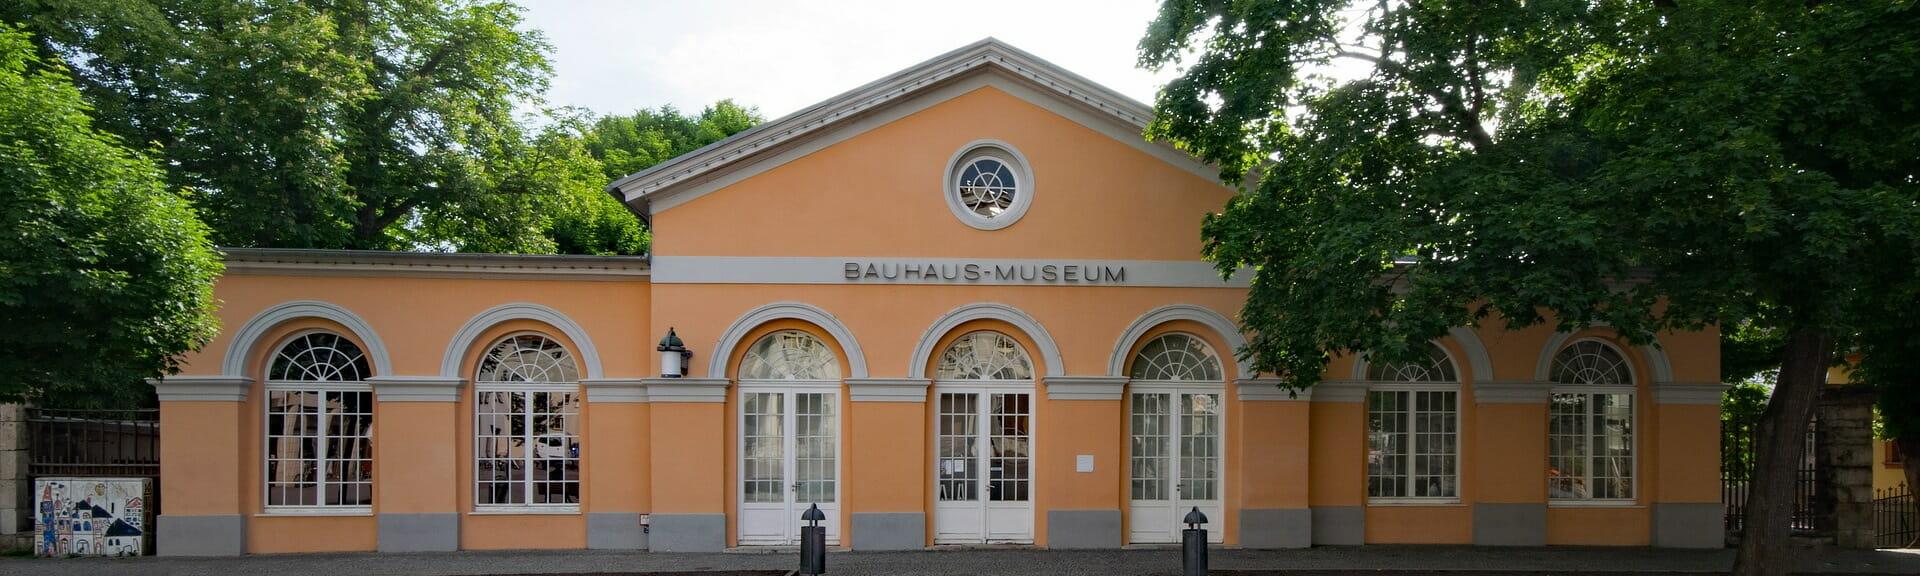 Klassenfahrt Weimar Bauhaus-Museum